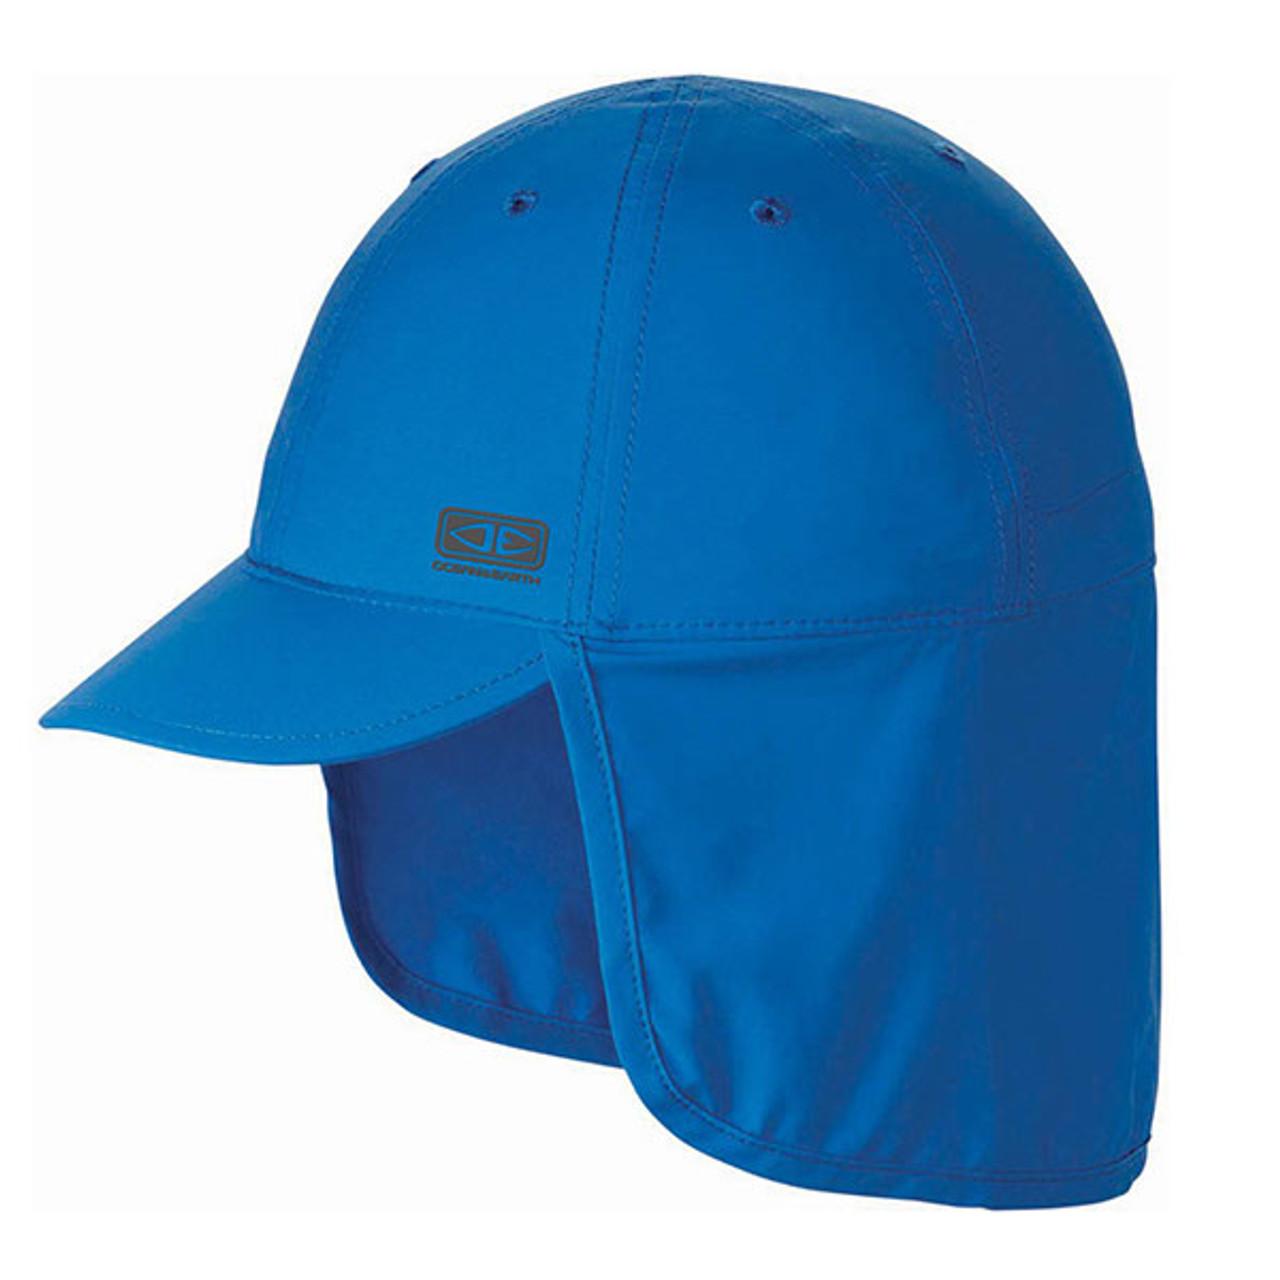 Toddlers Legionnaire Sunbreaker Beach Hat | Blue